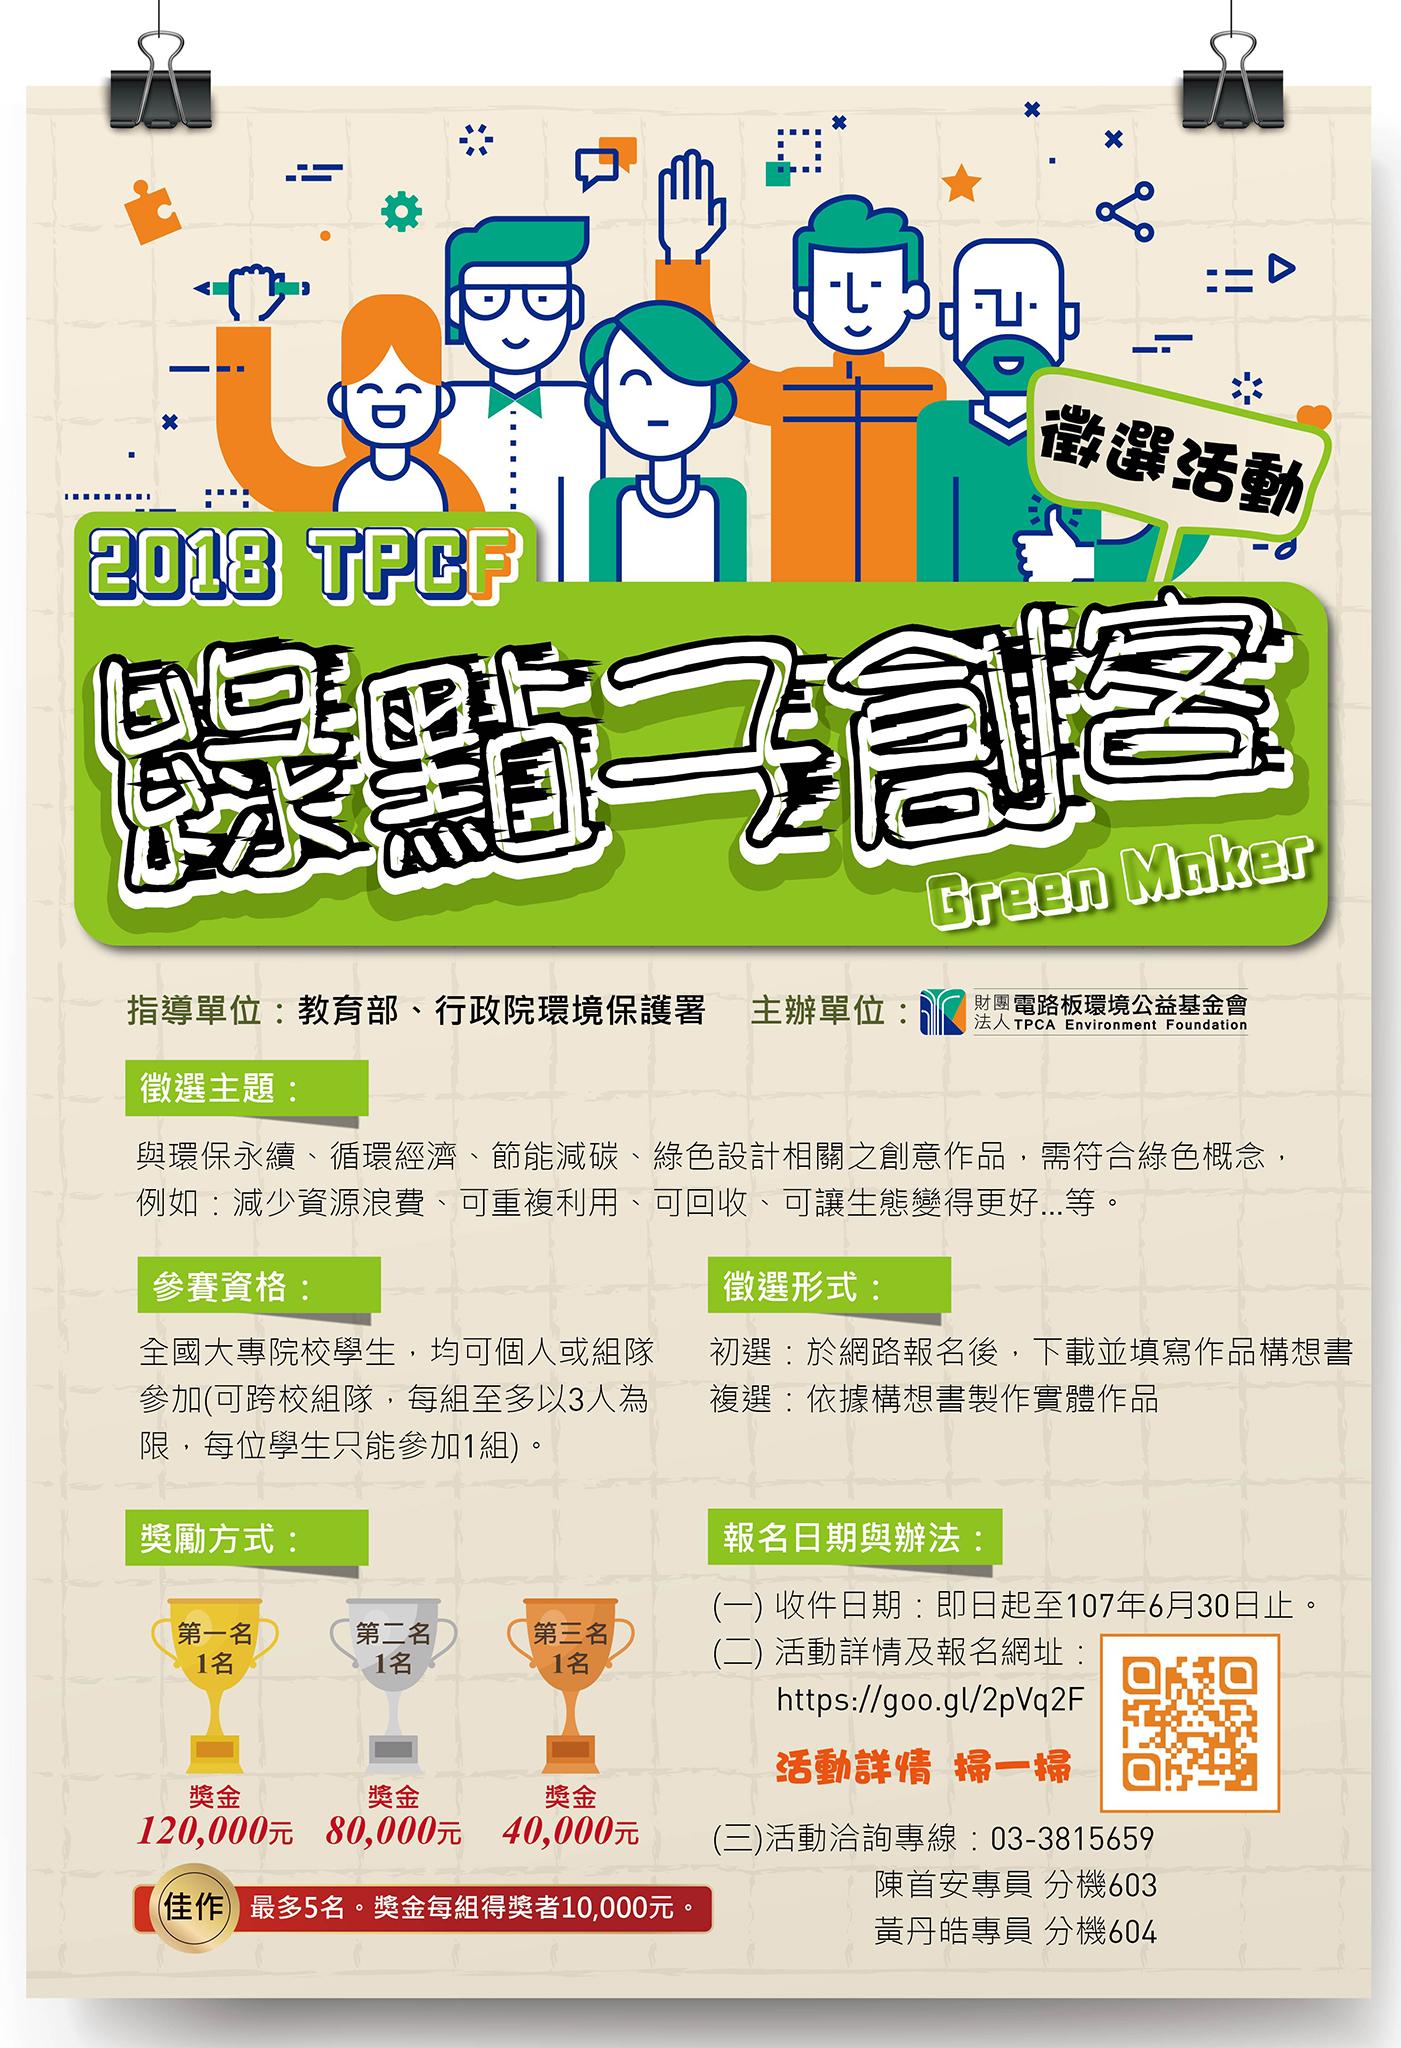 2018 TPCF綠點子創客(GreenMaker)徵選活動 海報